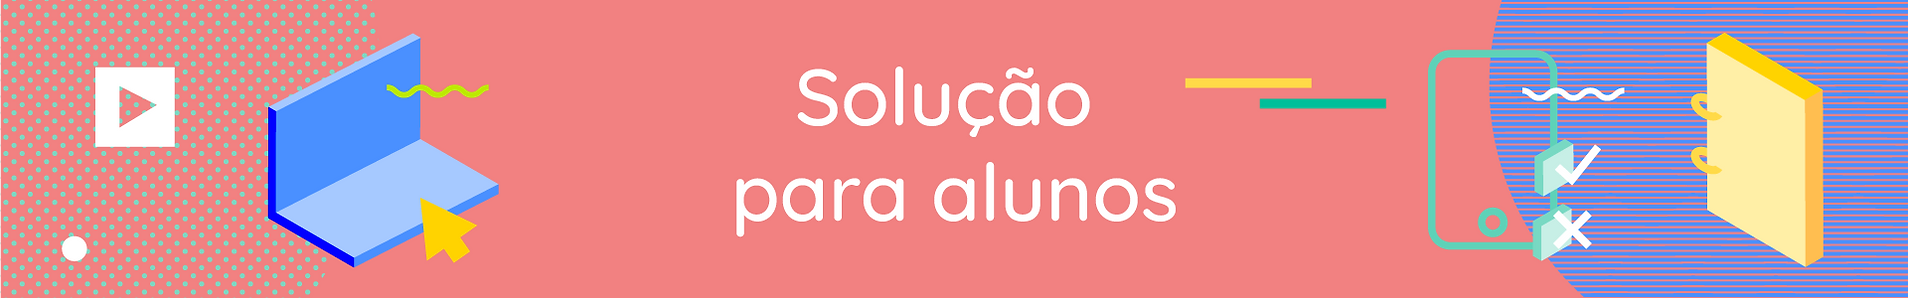 banner_alunos.png